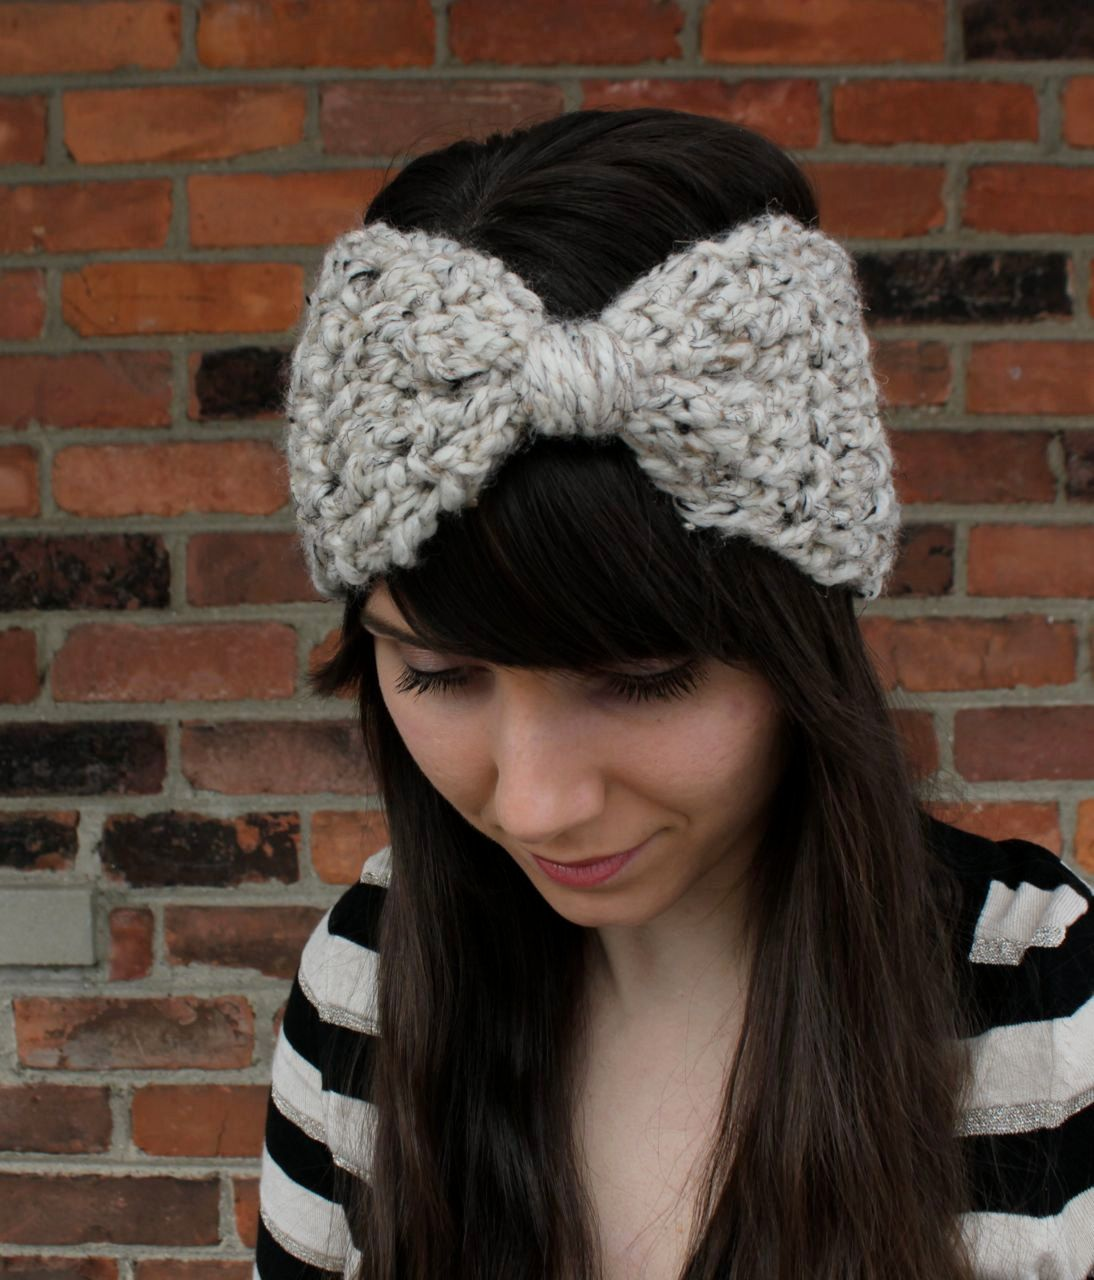 Crochet Ear Warmer Headband in Oatmeal Beige - Big Bow Headband Ear ...